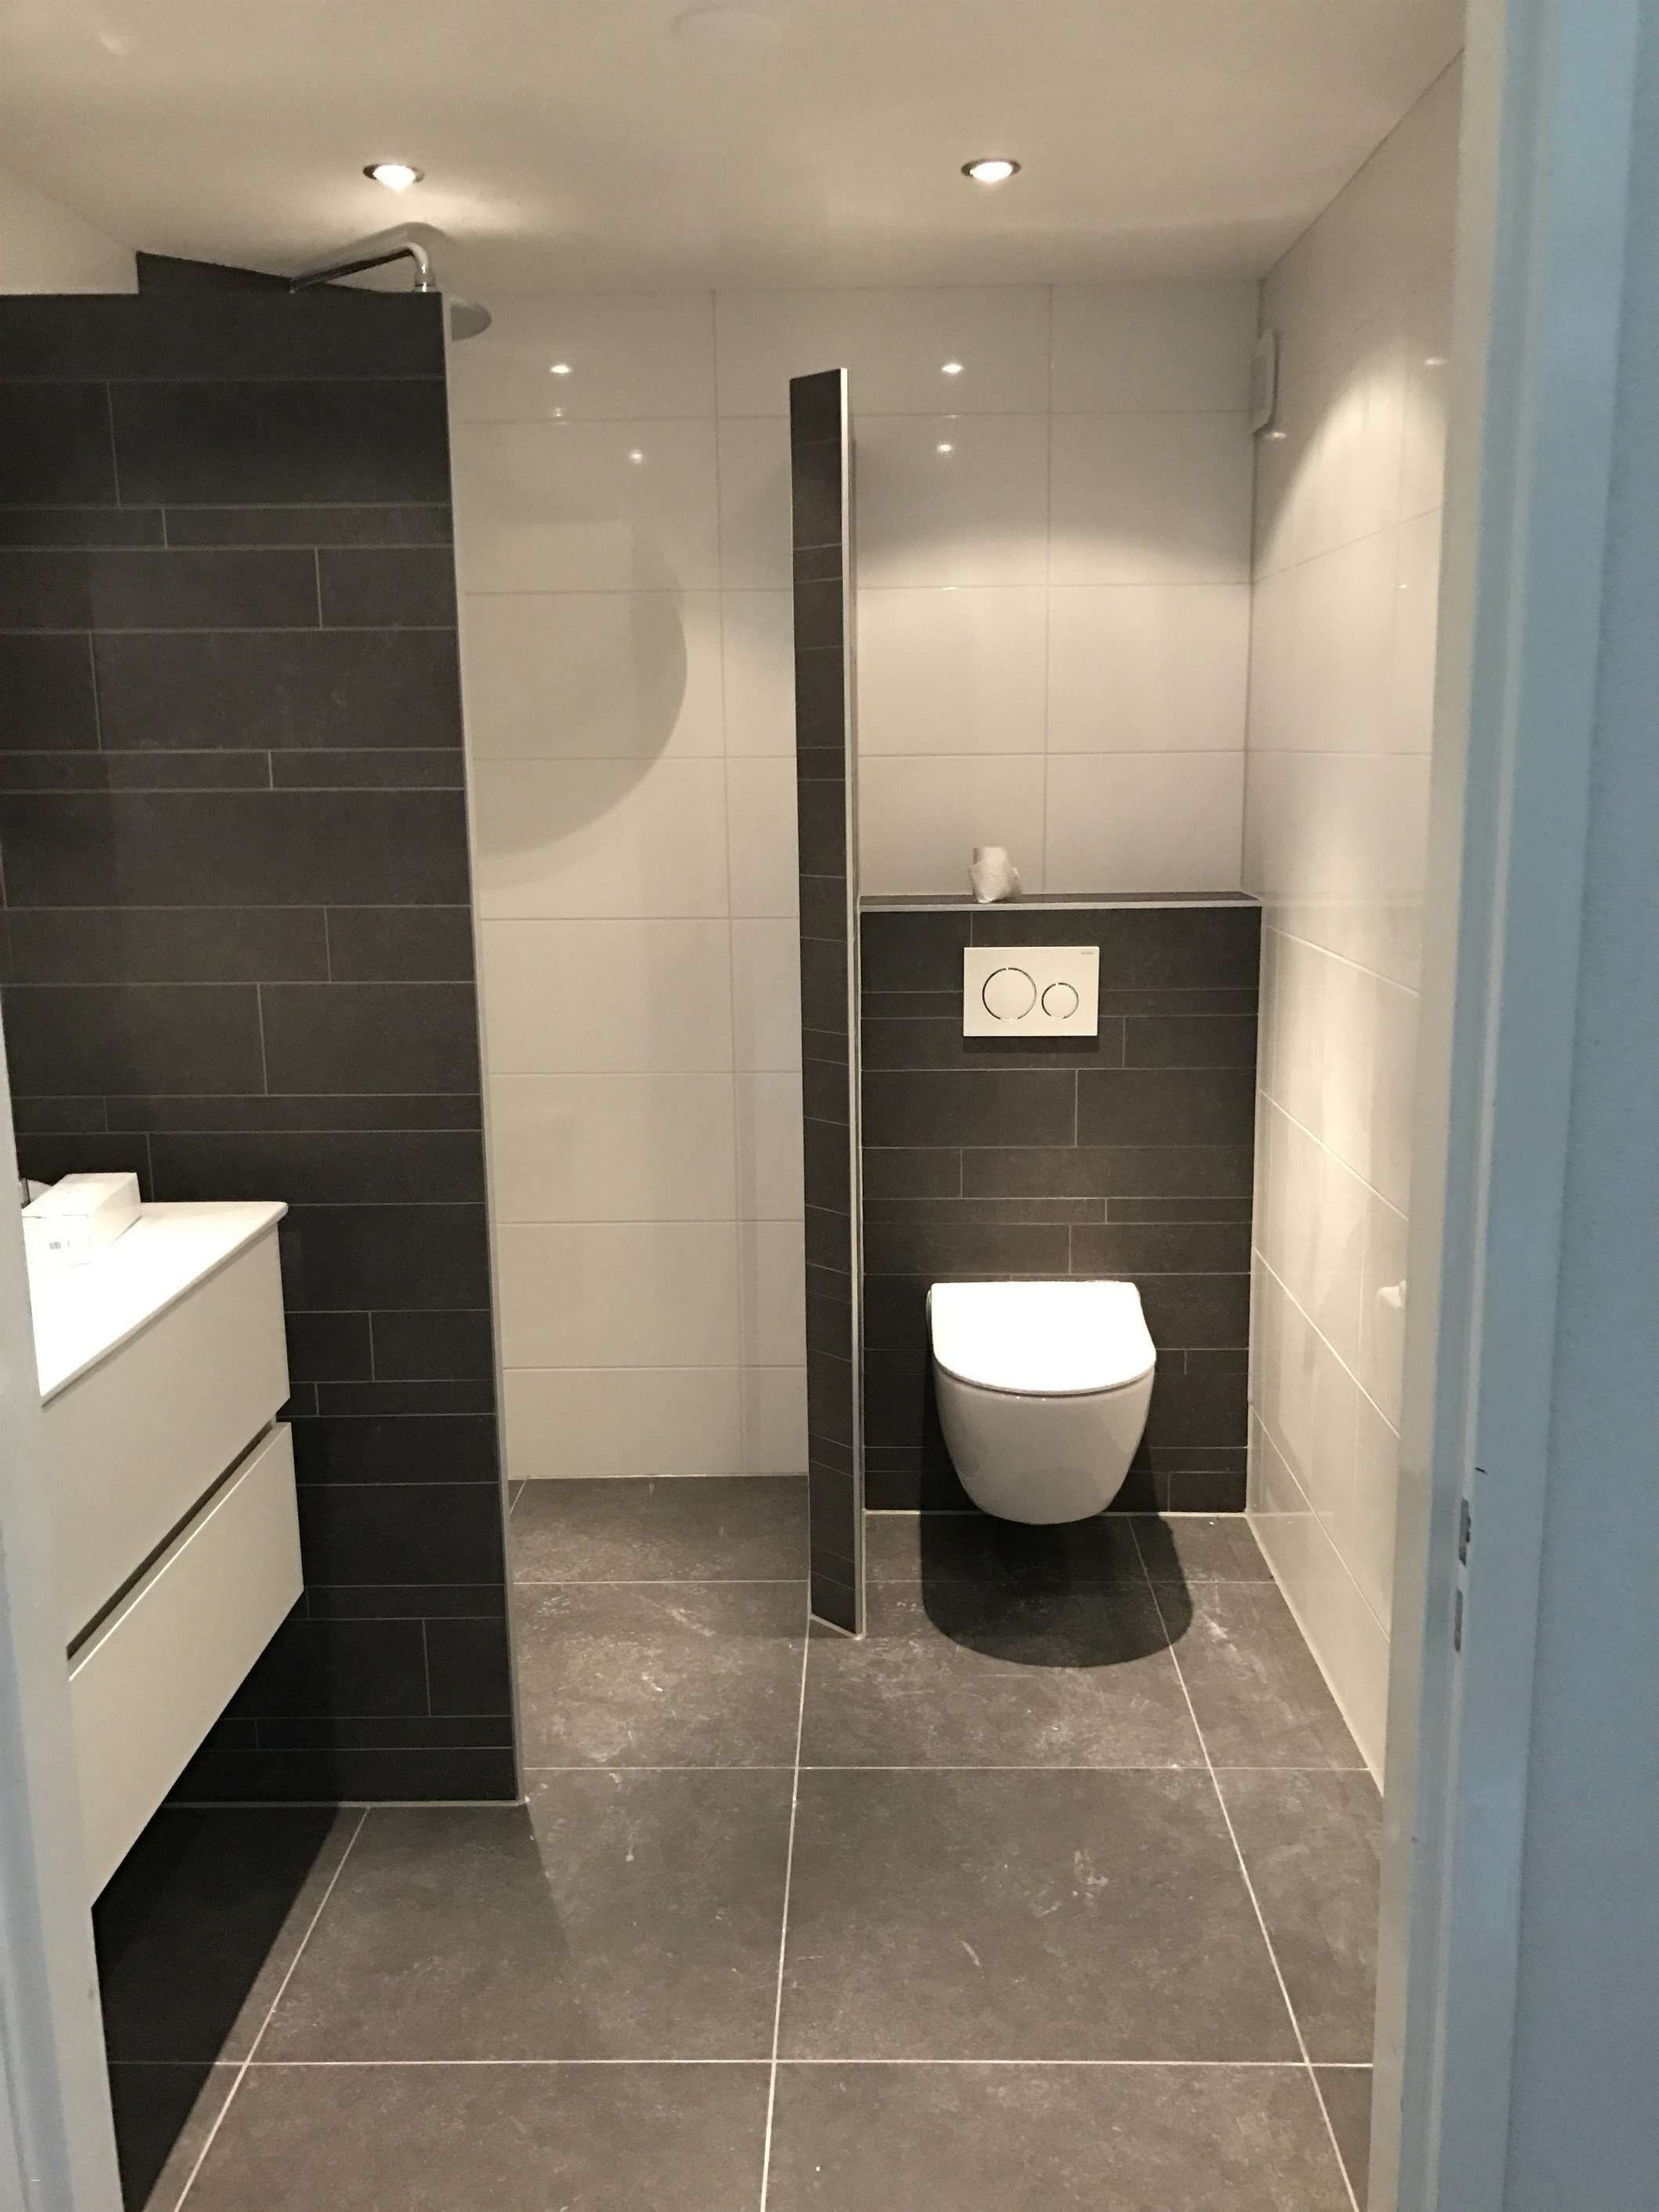 40 Bad Dekoration Wand   bath   Pinterest   Badezimmer ...